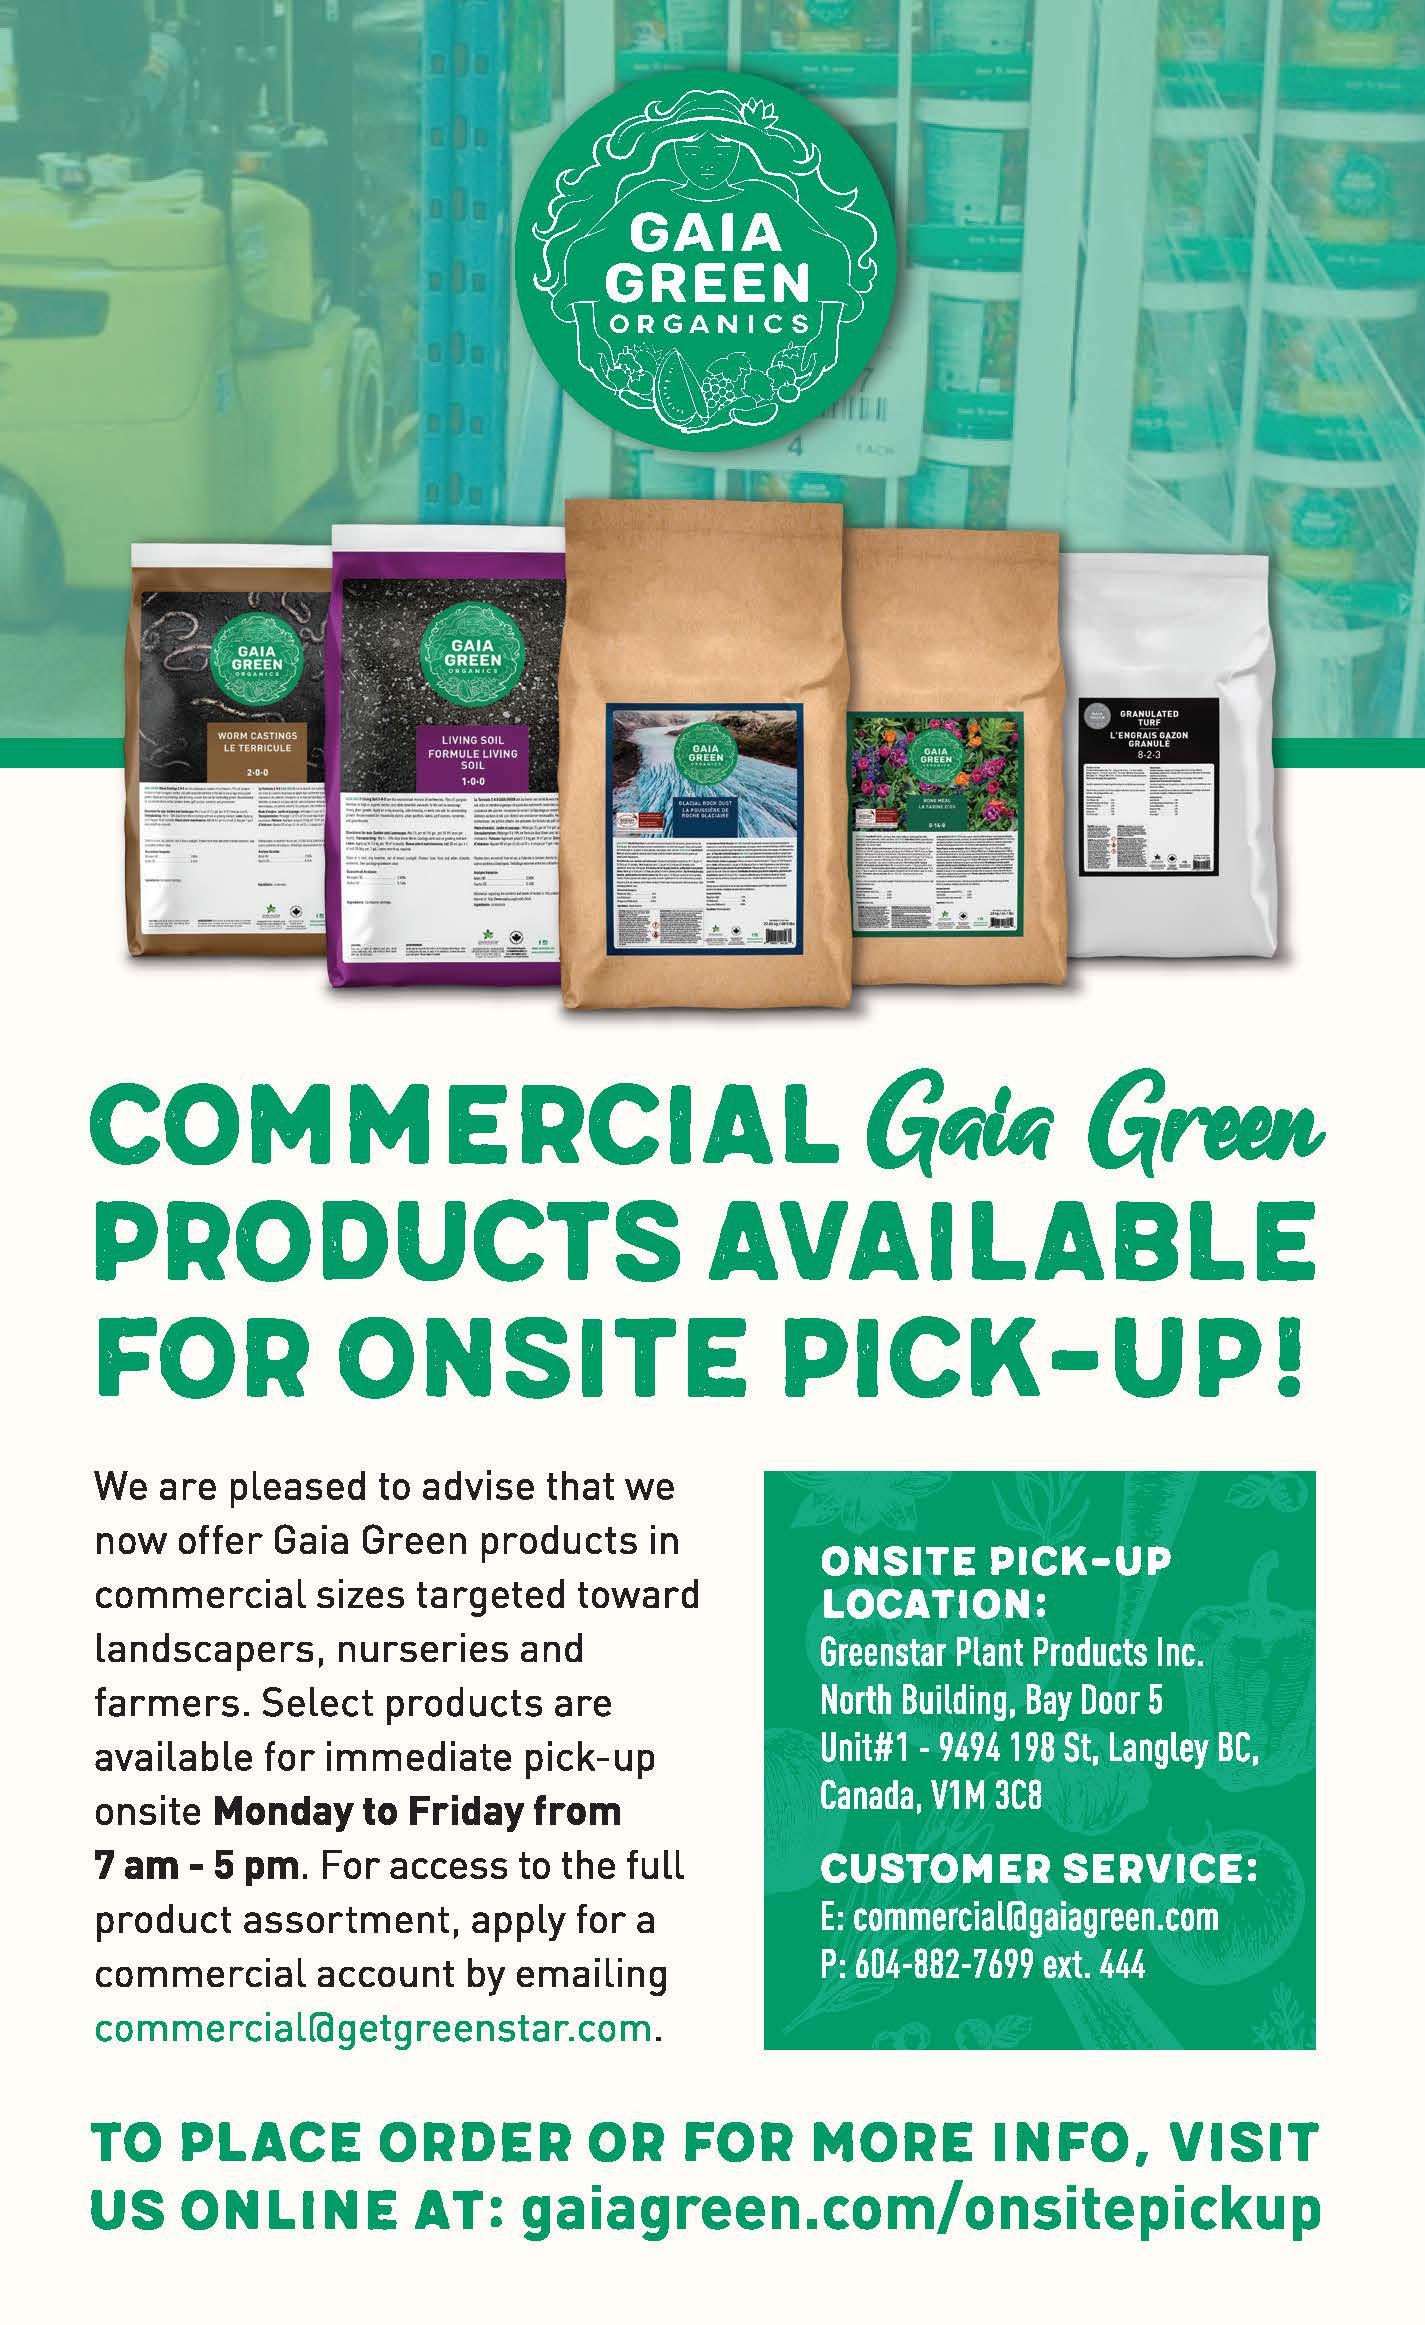 Gaia Green Organics